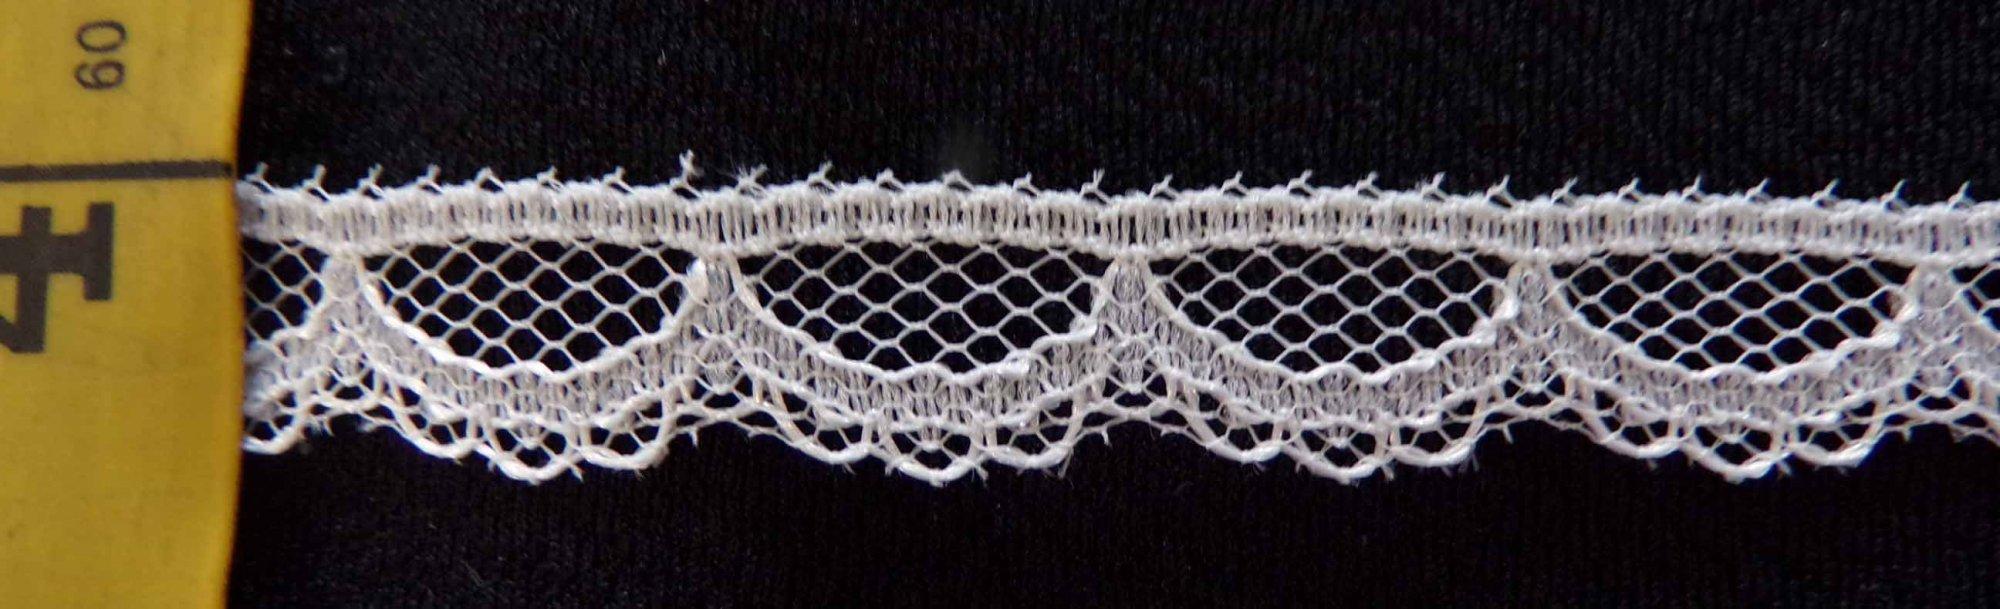 1/2 Rigid Lace - Ivory